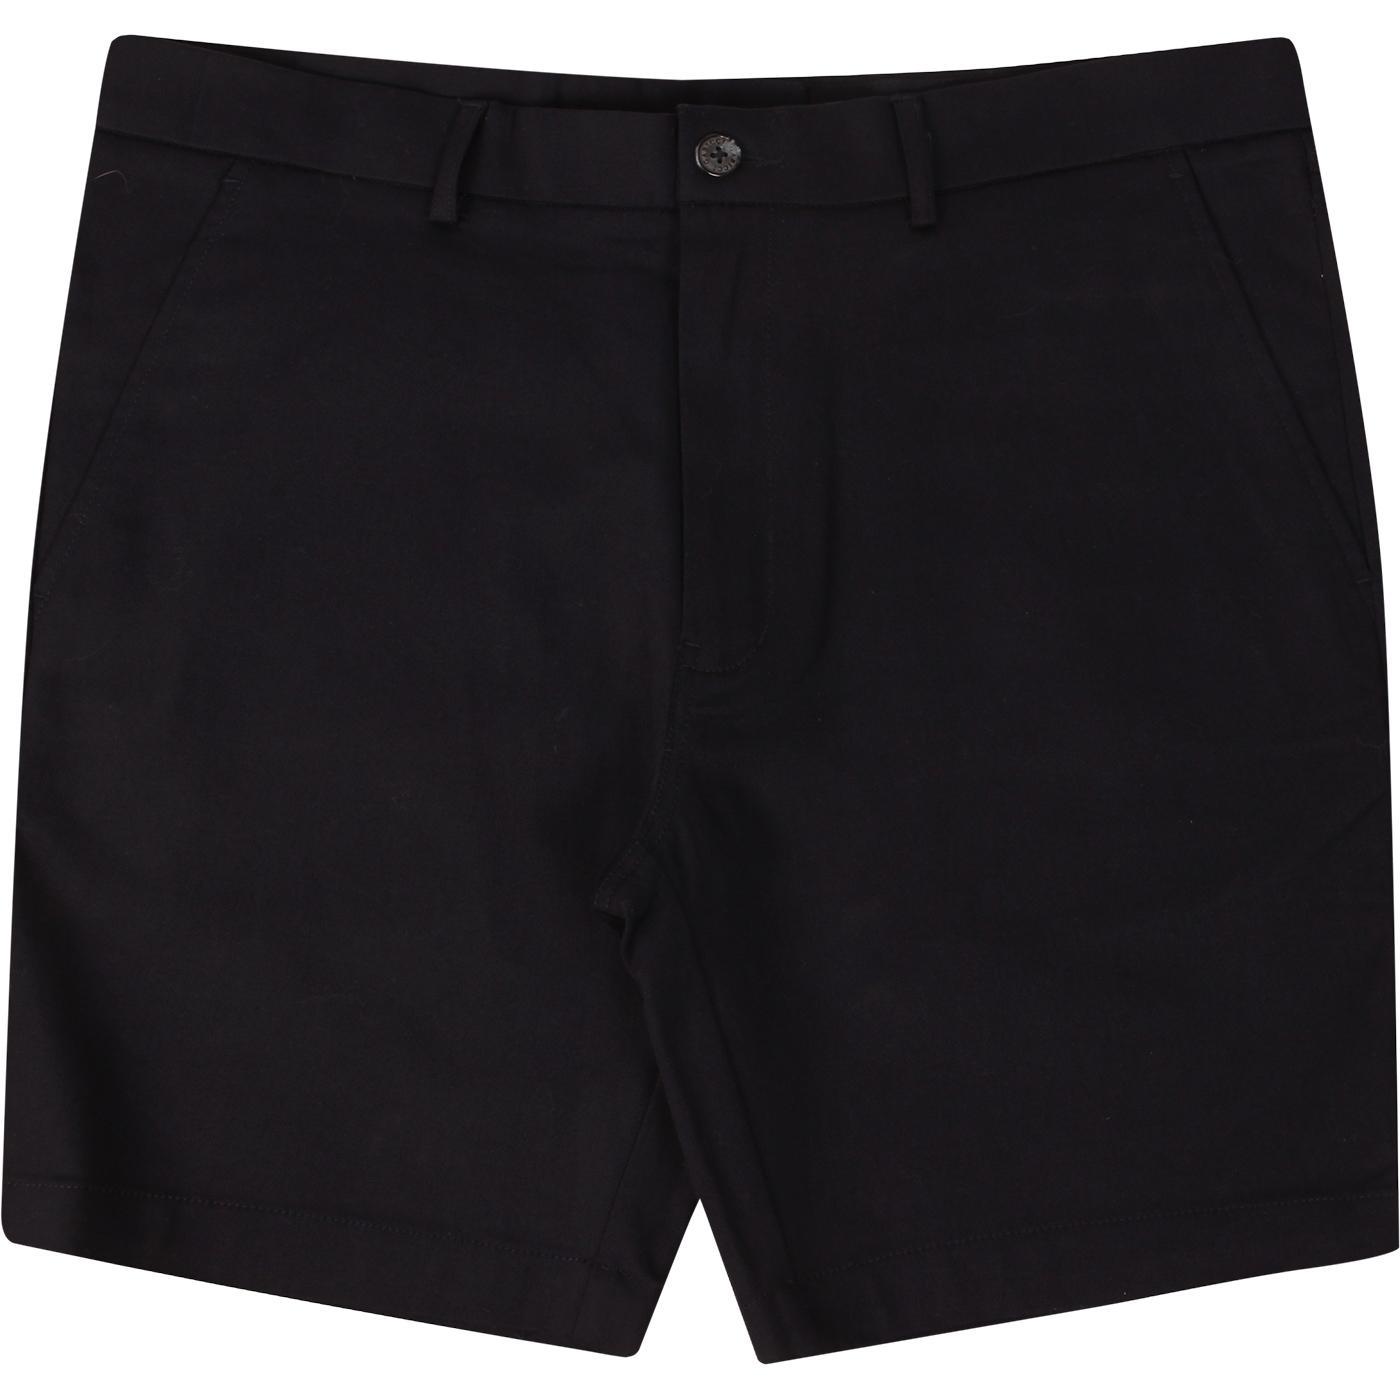 Cooper GABICCI VINTAGE Retro Chino Shorts (Navy)